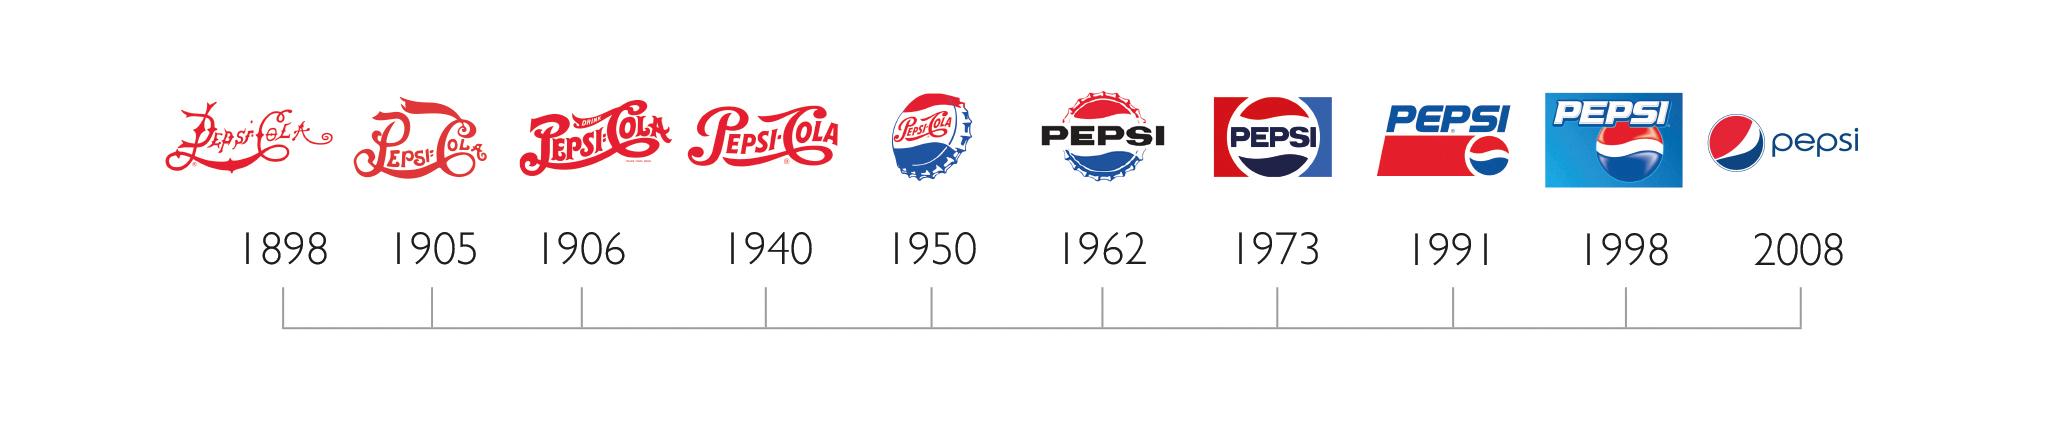 Evolution of Pepsi logo